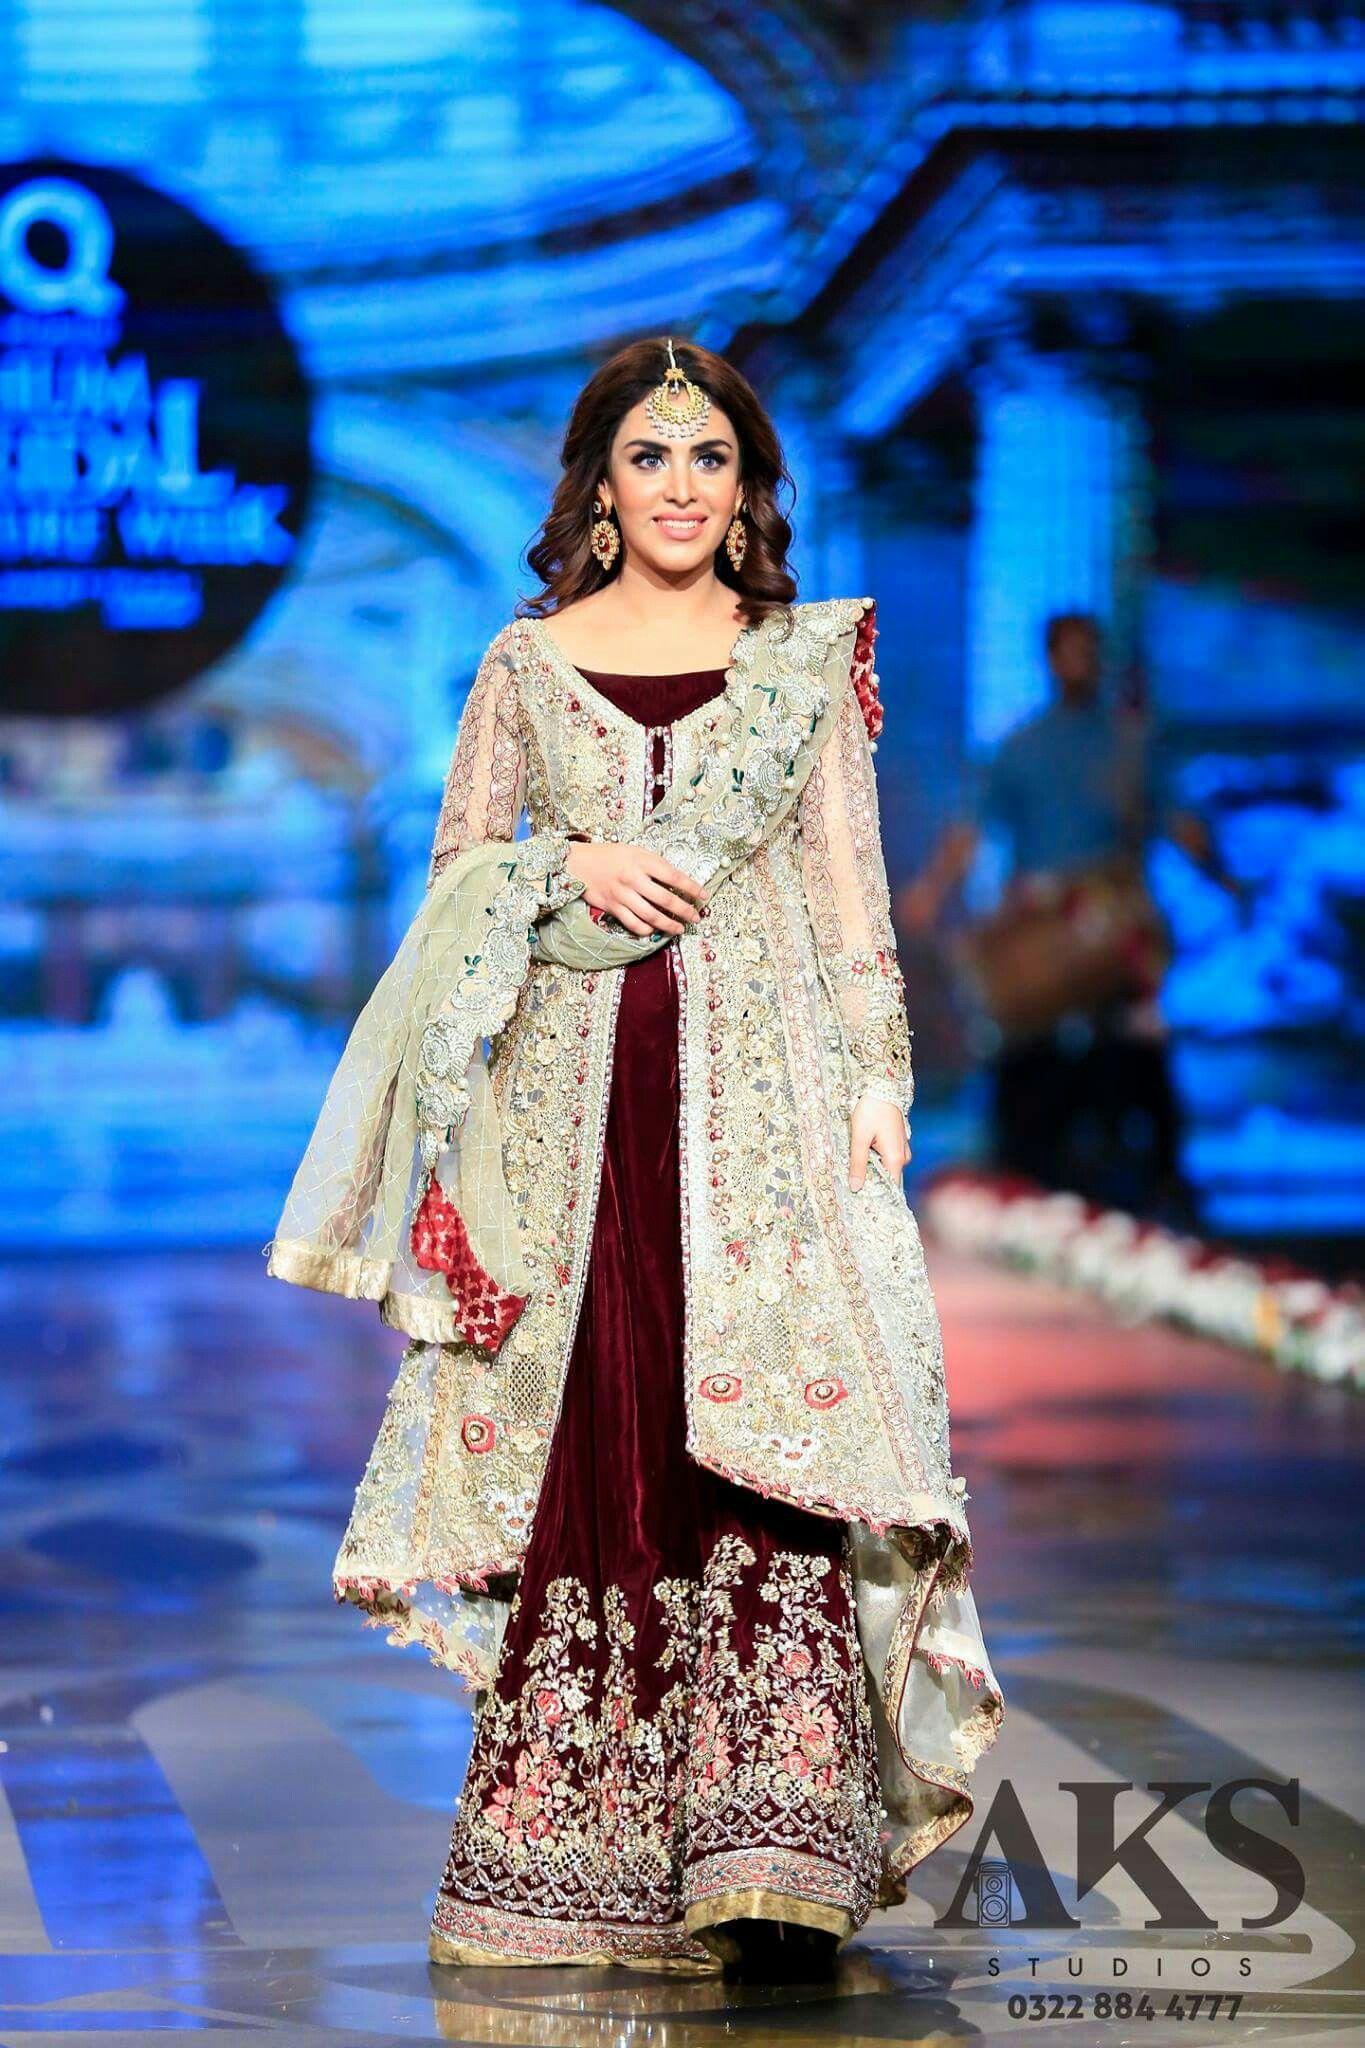 Pin by WomansVilla on Designer Salwar Suits | Pinterest | Wedding ...